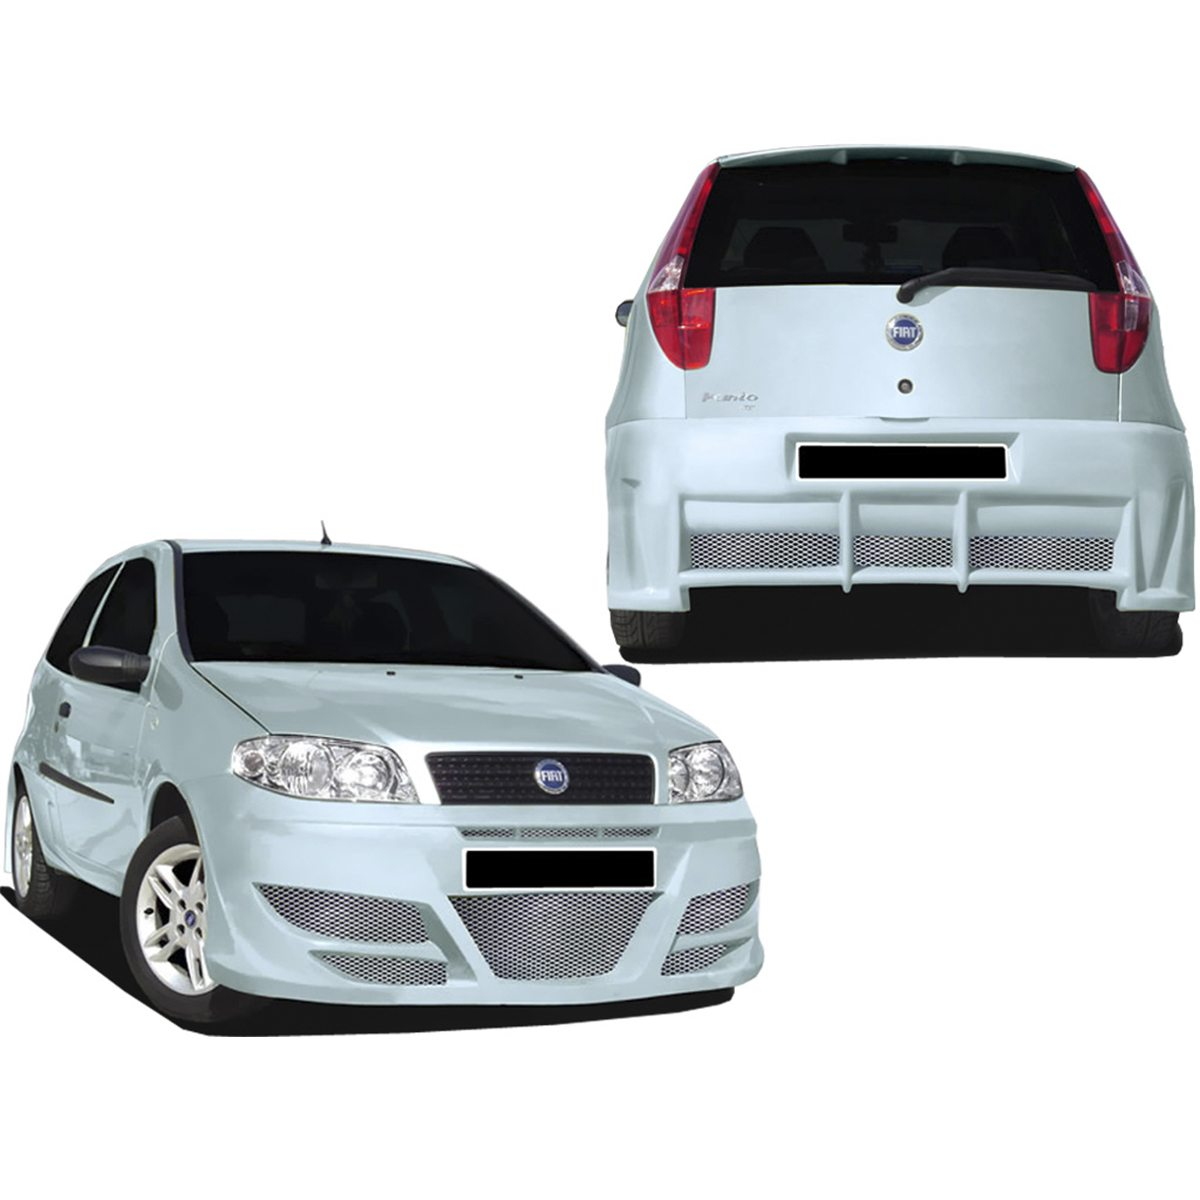 Fiat-Punto-04-3P-Shadow-KIT-KTS029